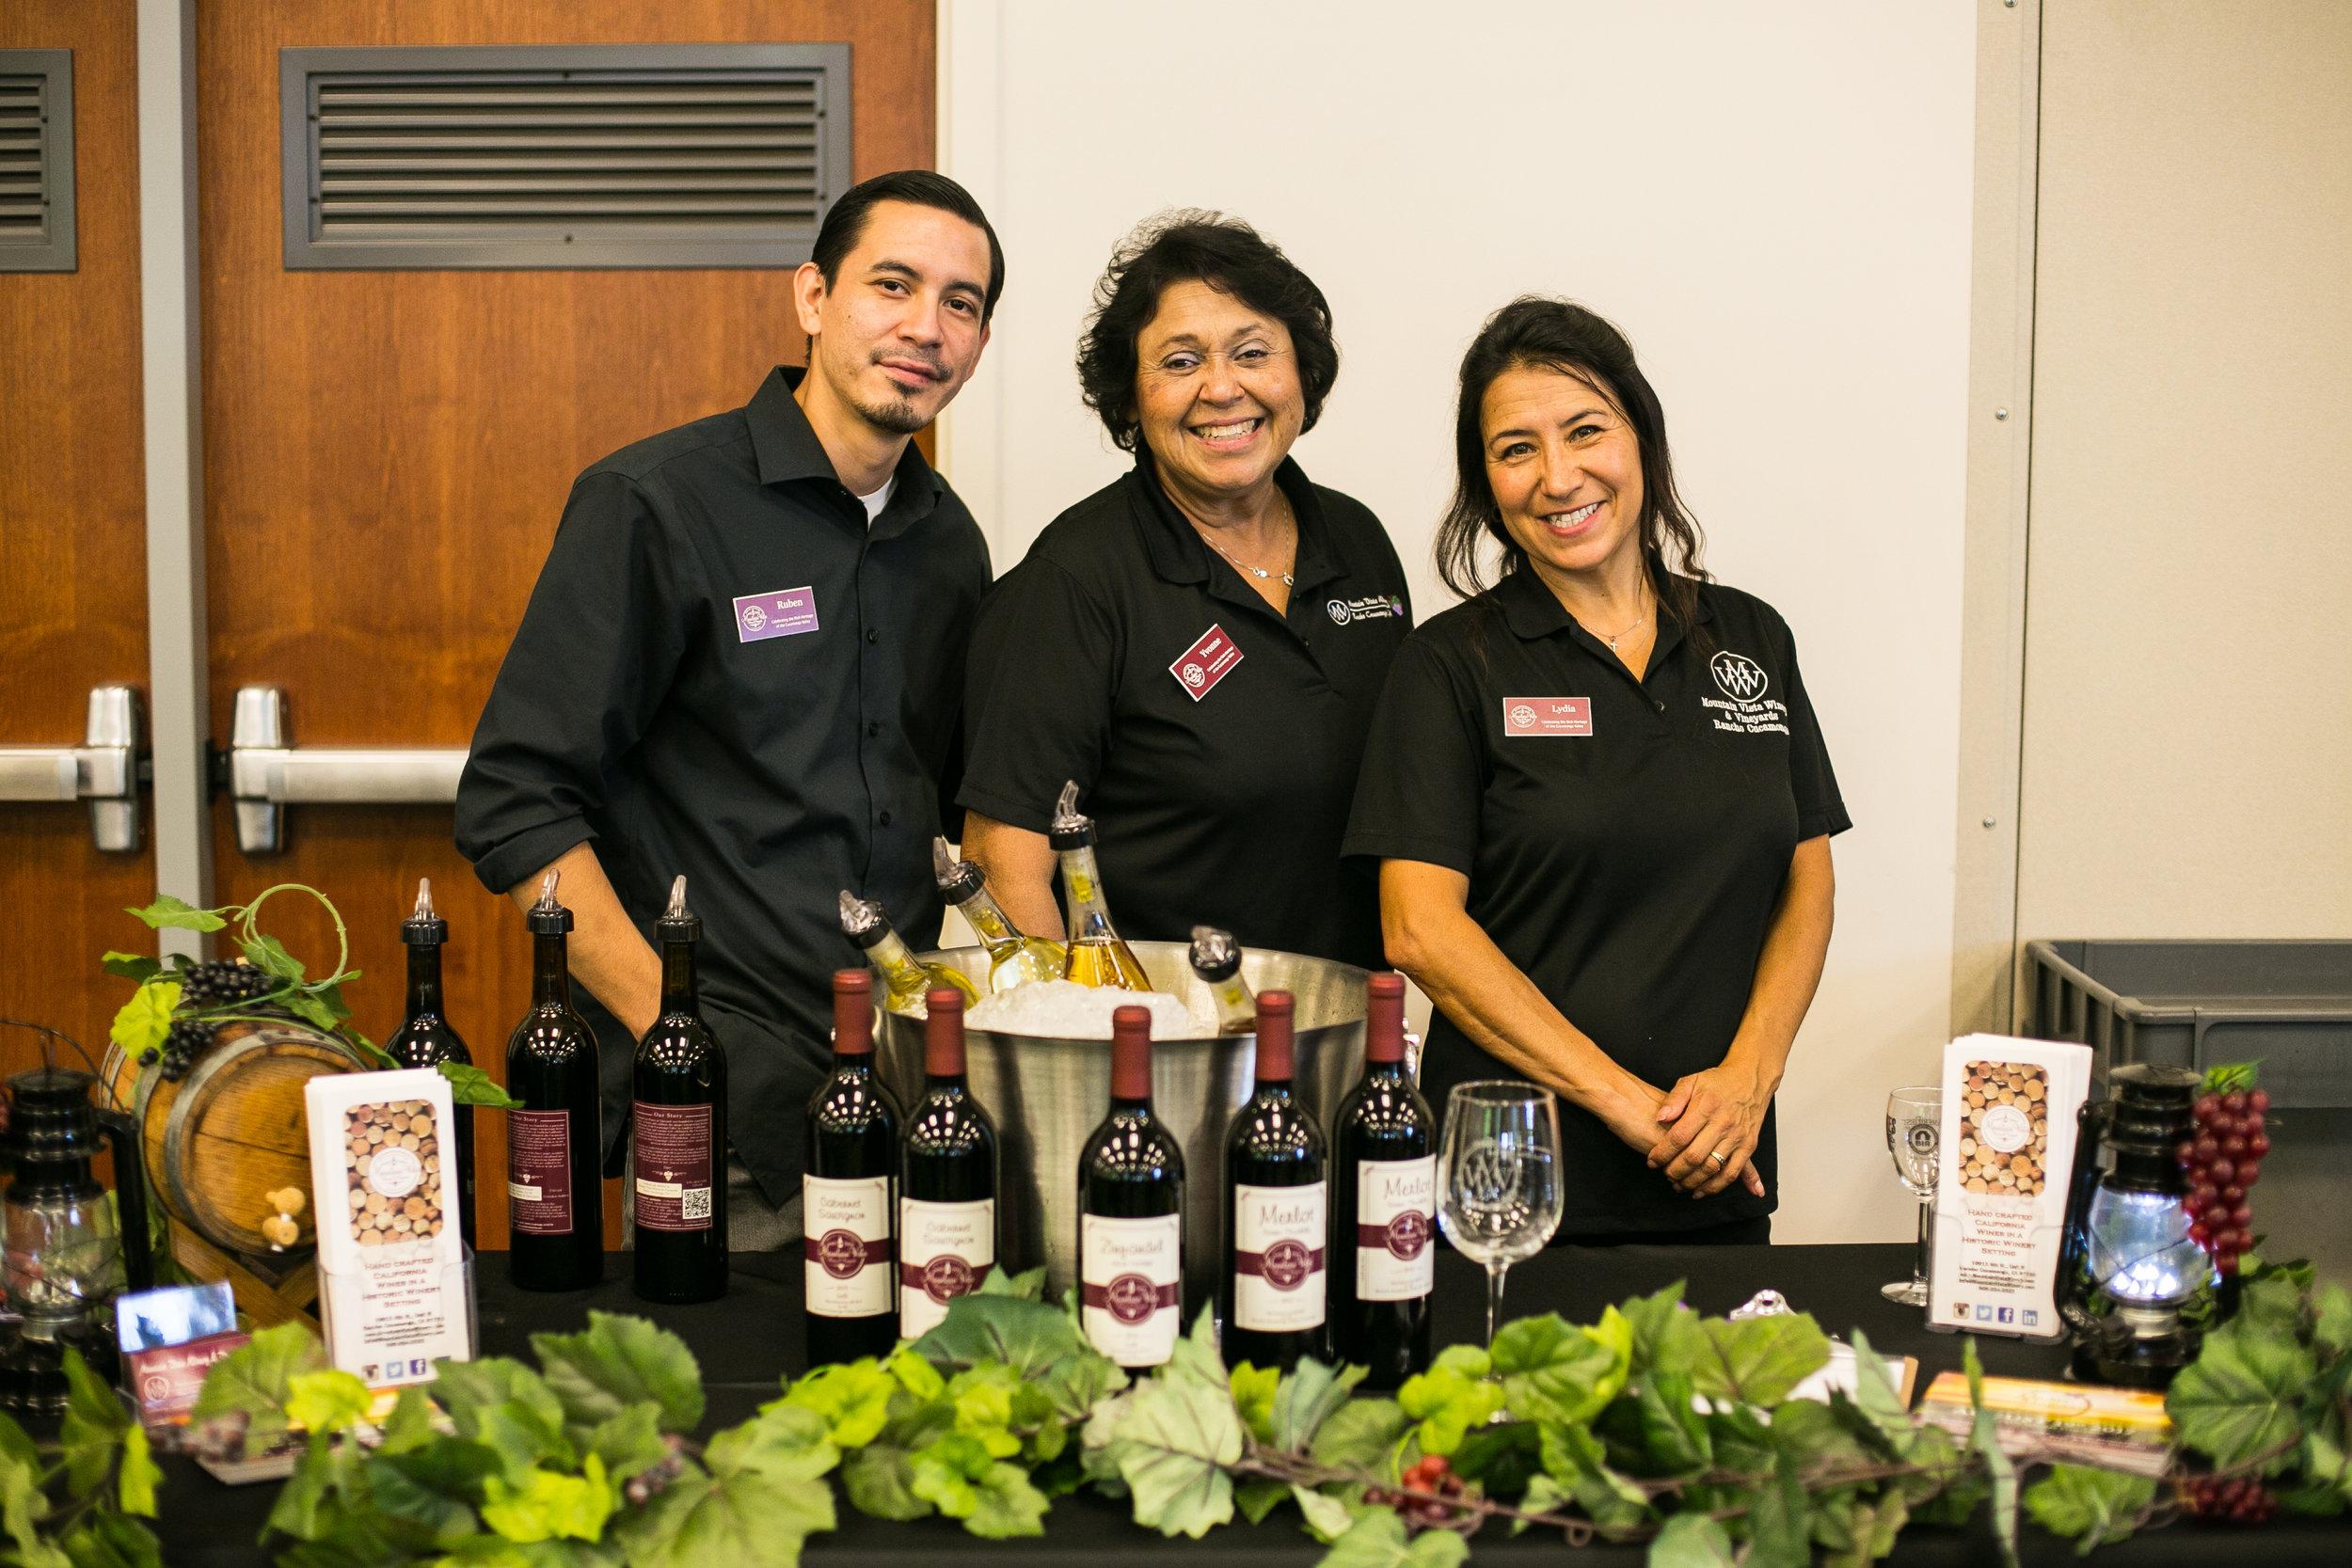 Mountain Vista Winery & Vineyards